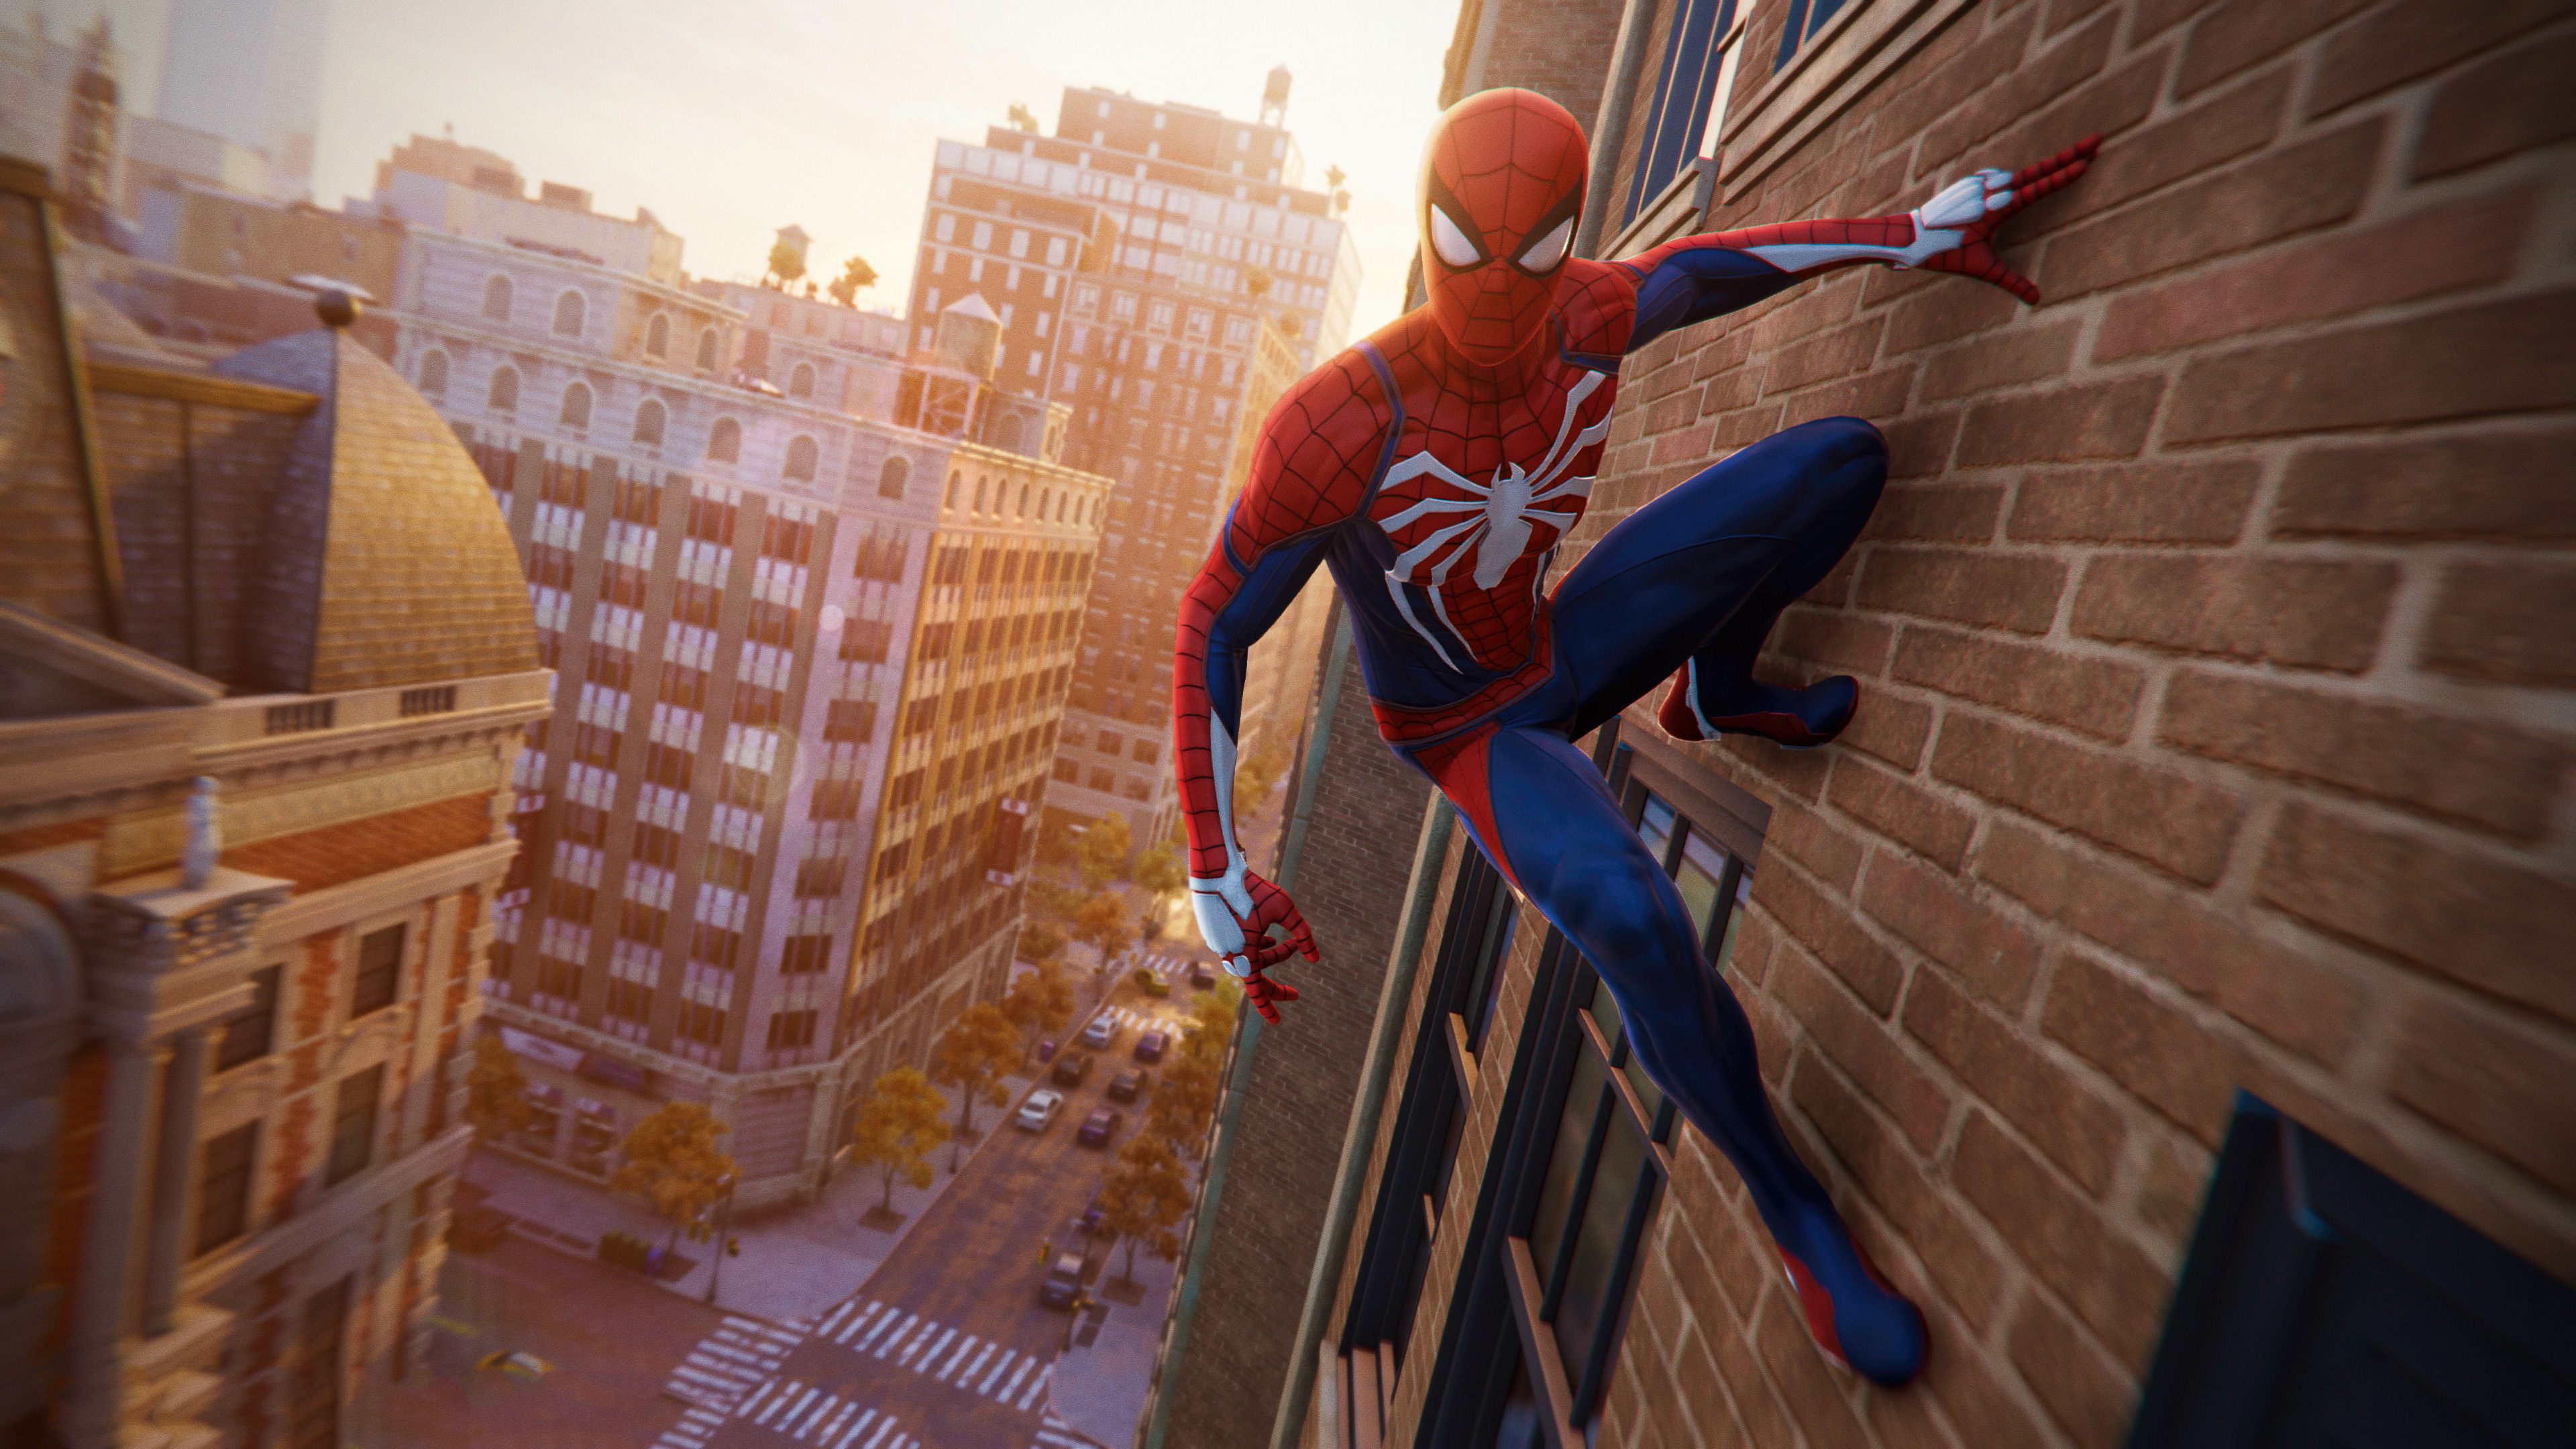 spiderman ps4 game 2018 4k 1537691510 - Spiderman Ps4 Game 2018 4k - superheroes wallpapers, spiderman wallpapers, spiderman ps4 wallpapers, ps games wallpapers, hd-wallpapers, games wallpapers, 4k-wallpapers, 2018 games wallpapers